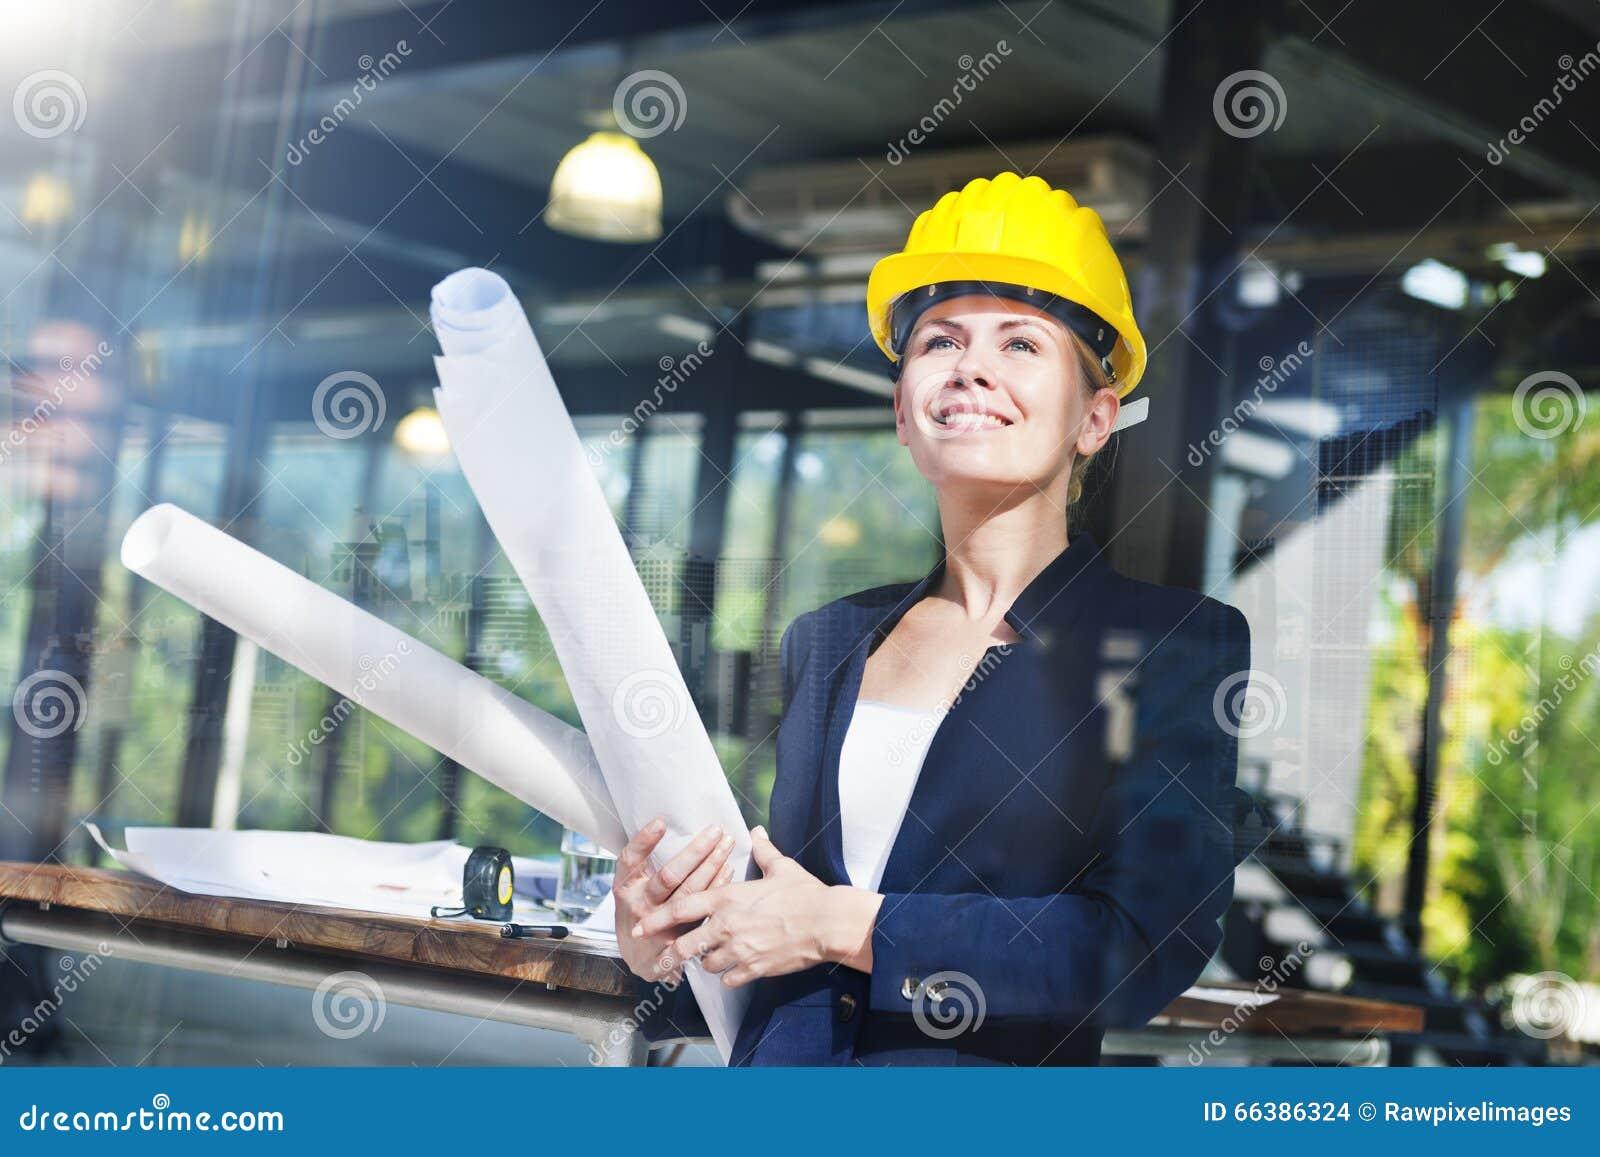 Technik-Frauen-Inspirations-Innenarchitektur-Konzept